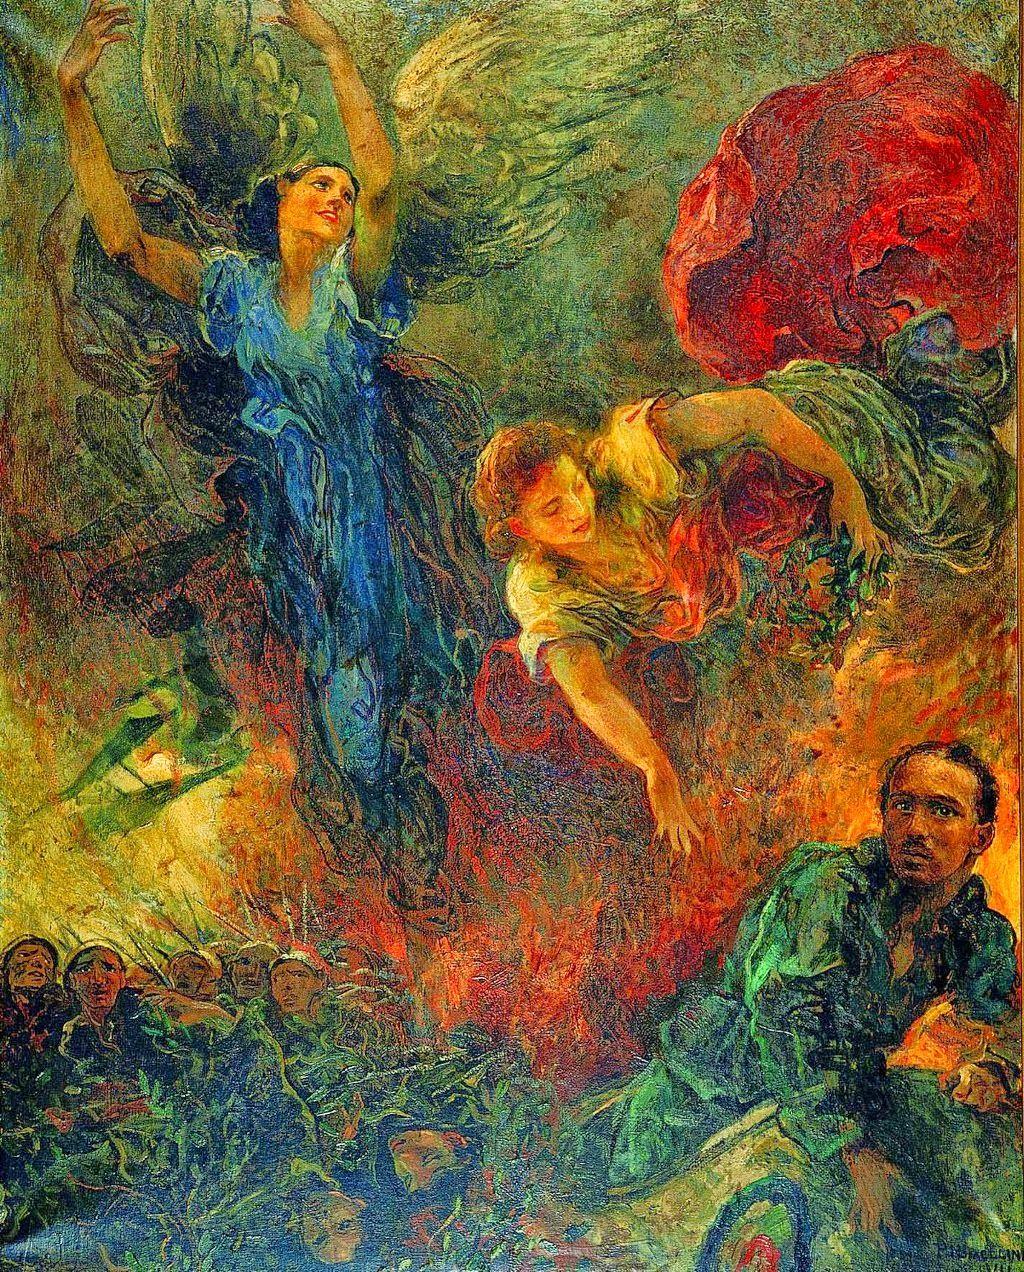 Neo Impressionism Artists: Italian Divisionism/Neo-Impressionism